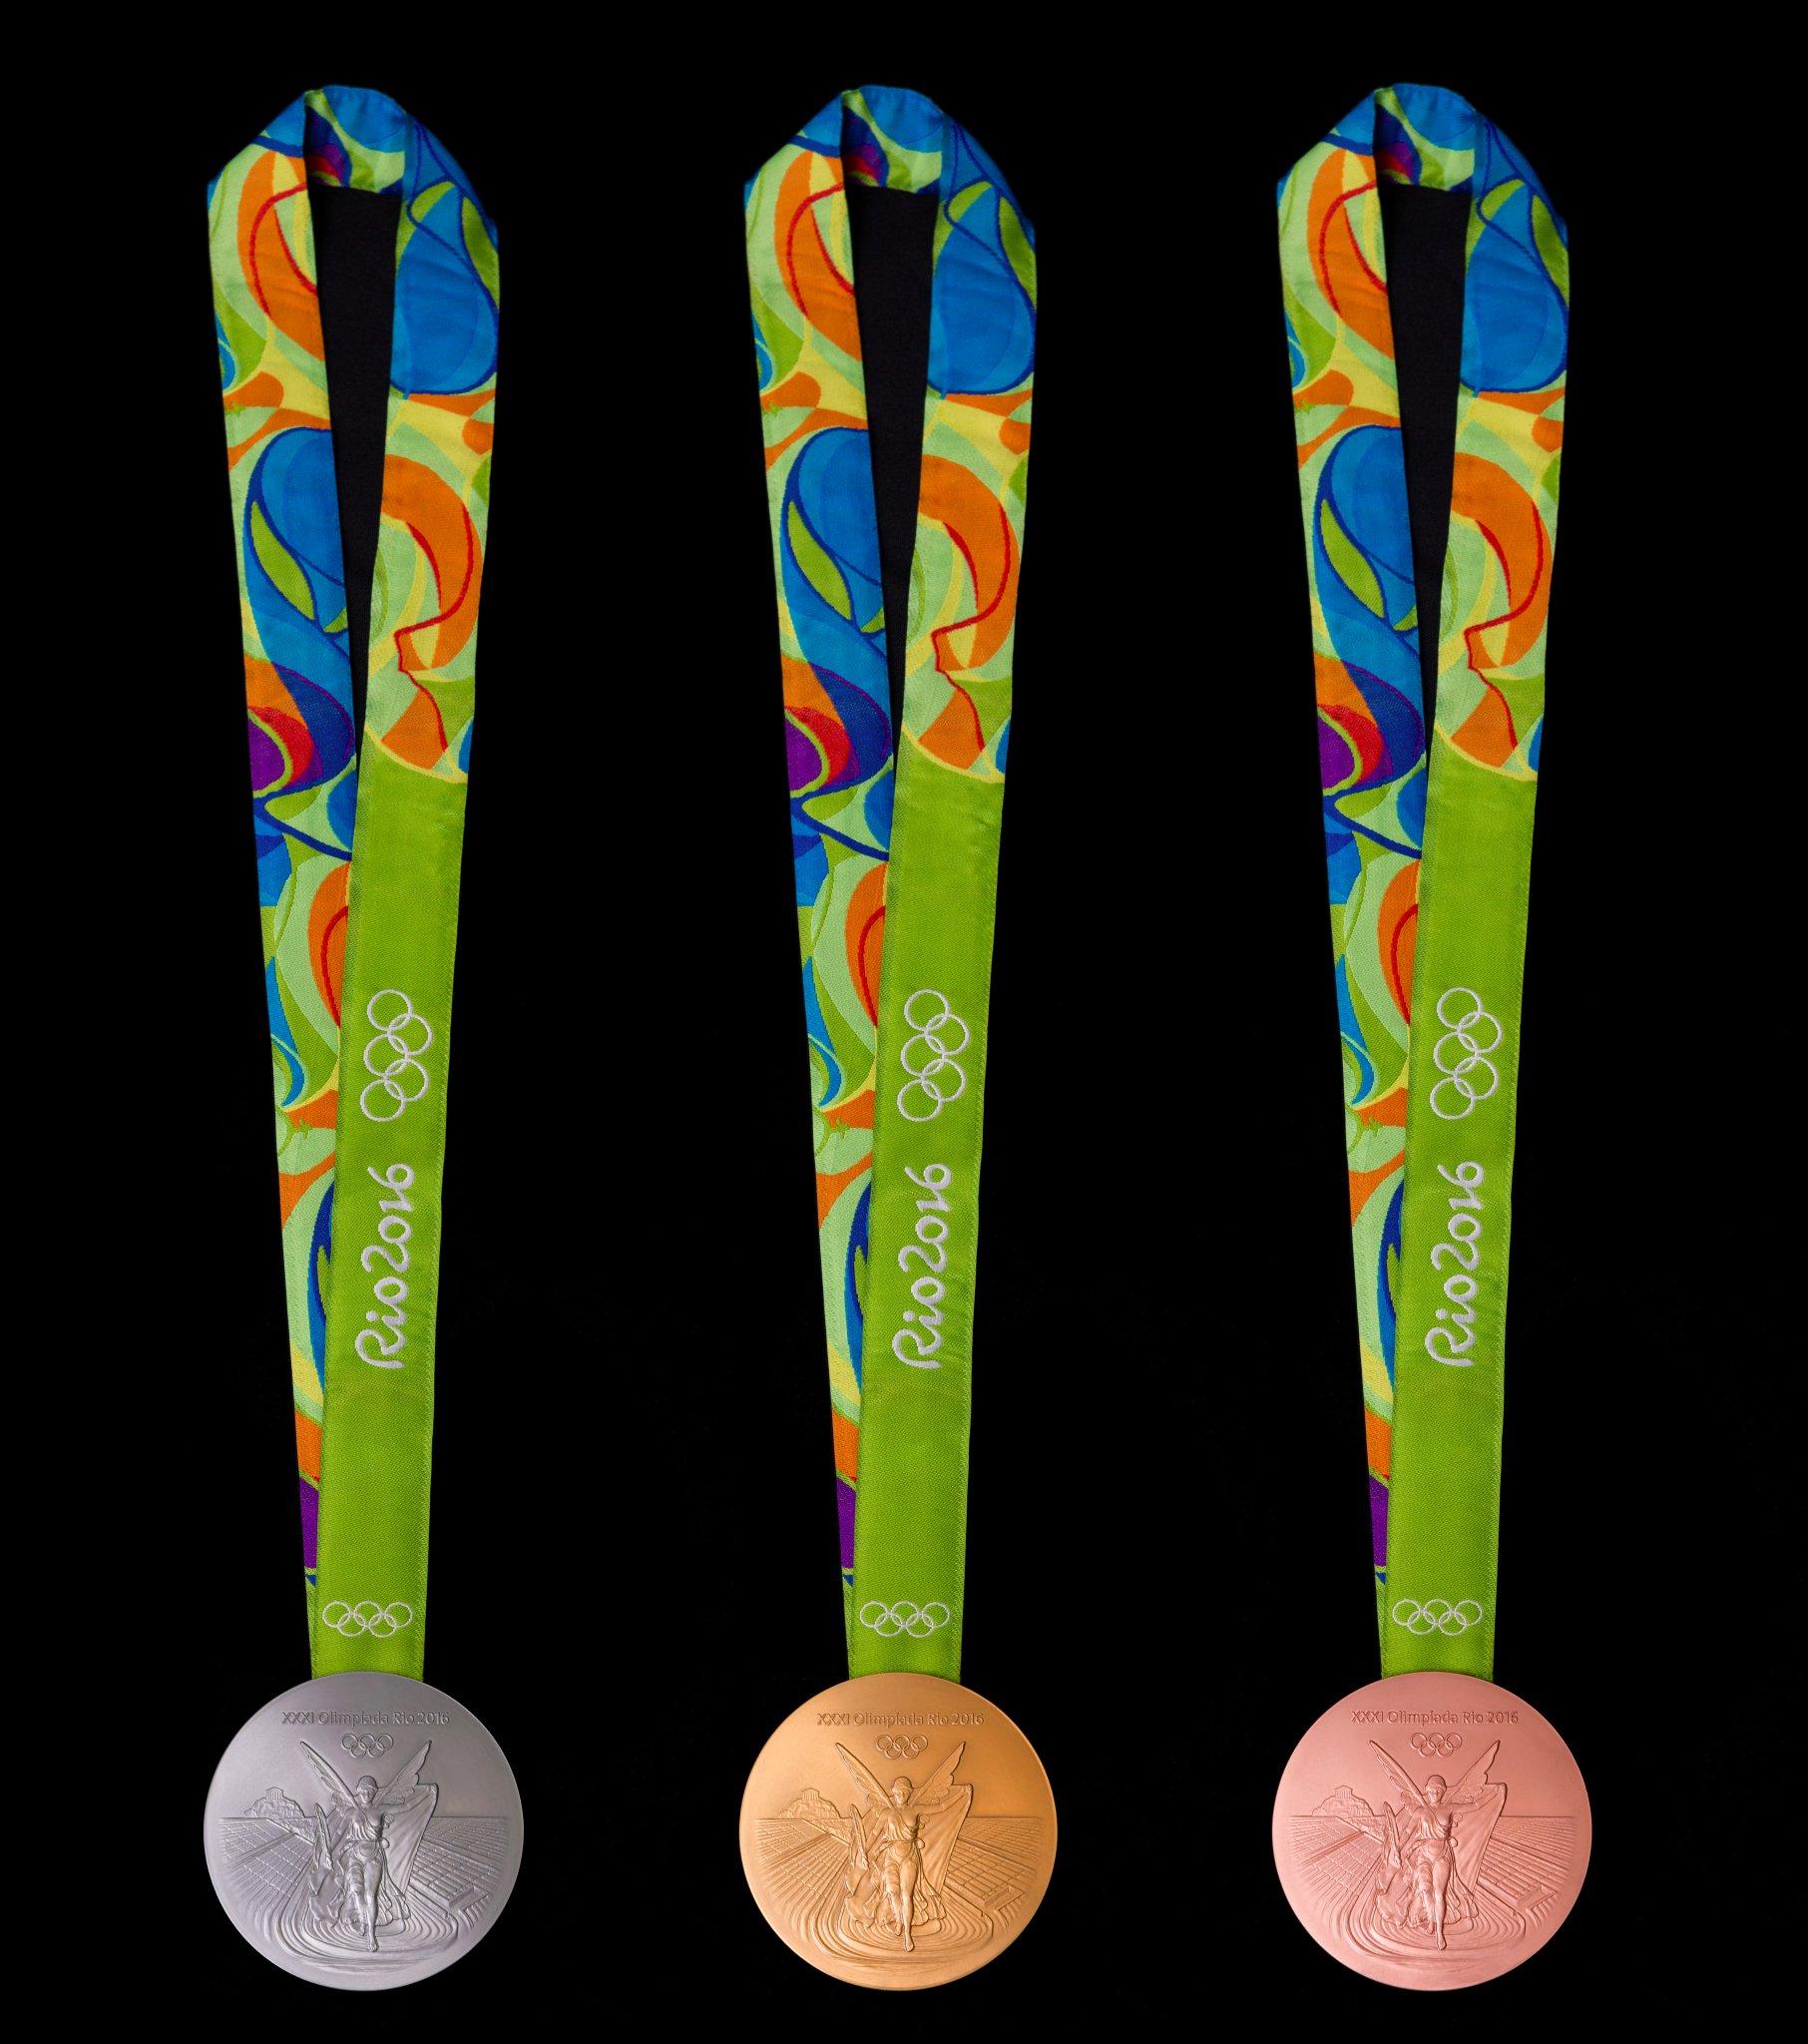 2016-olympics-medals-back